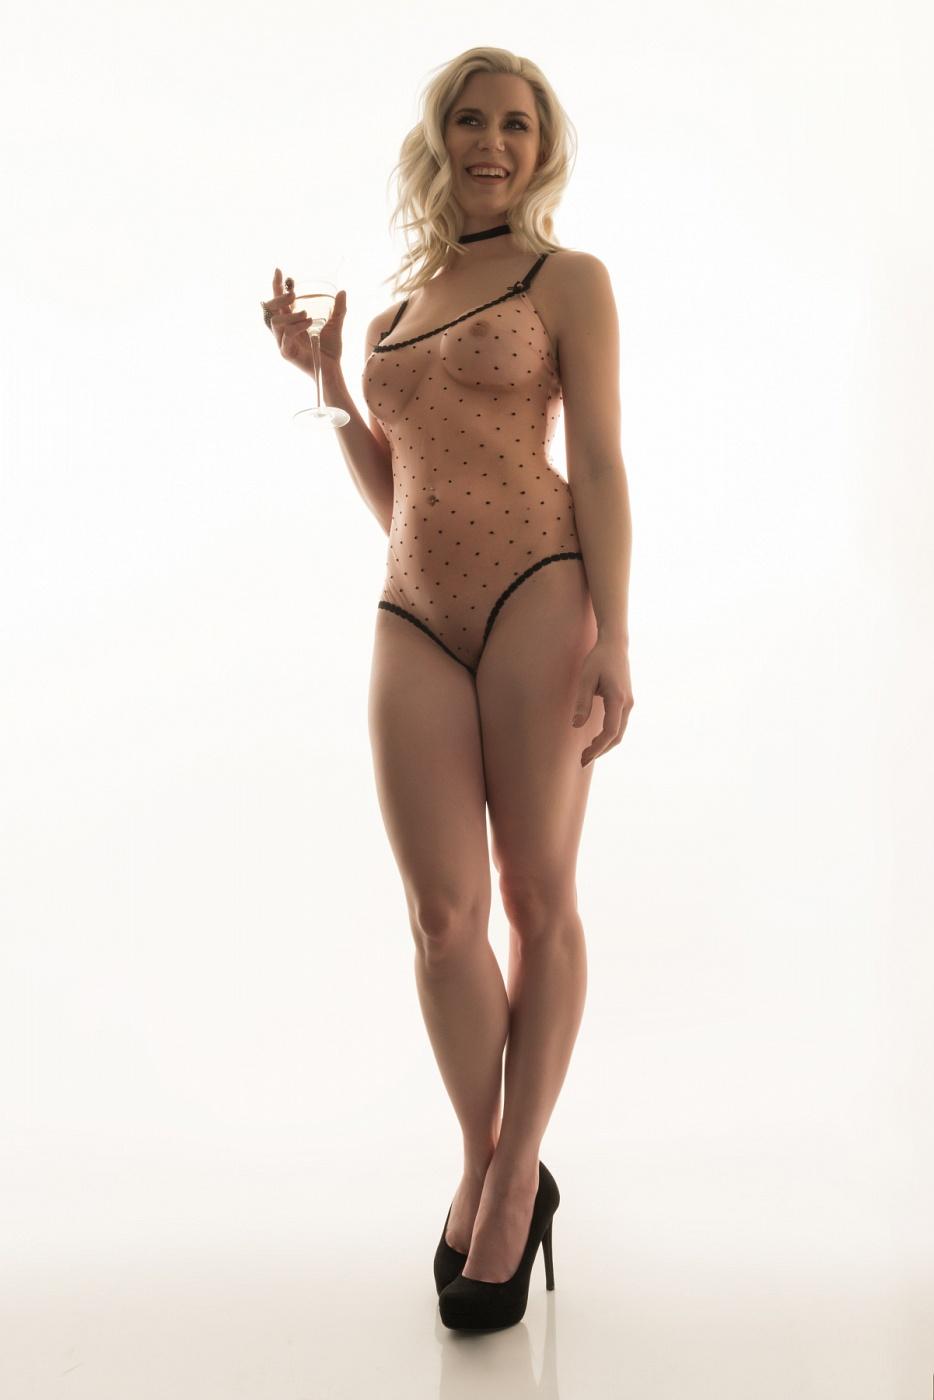 Ariya Sloane